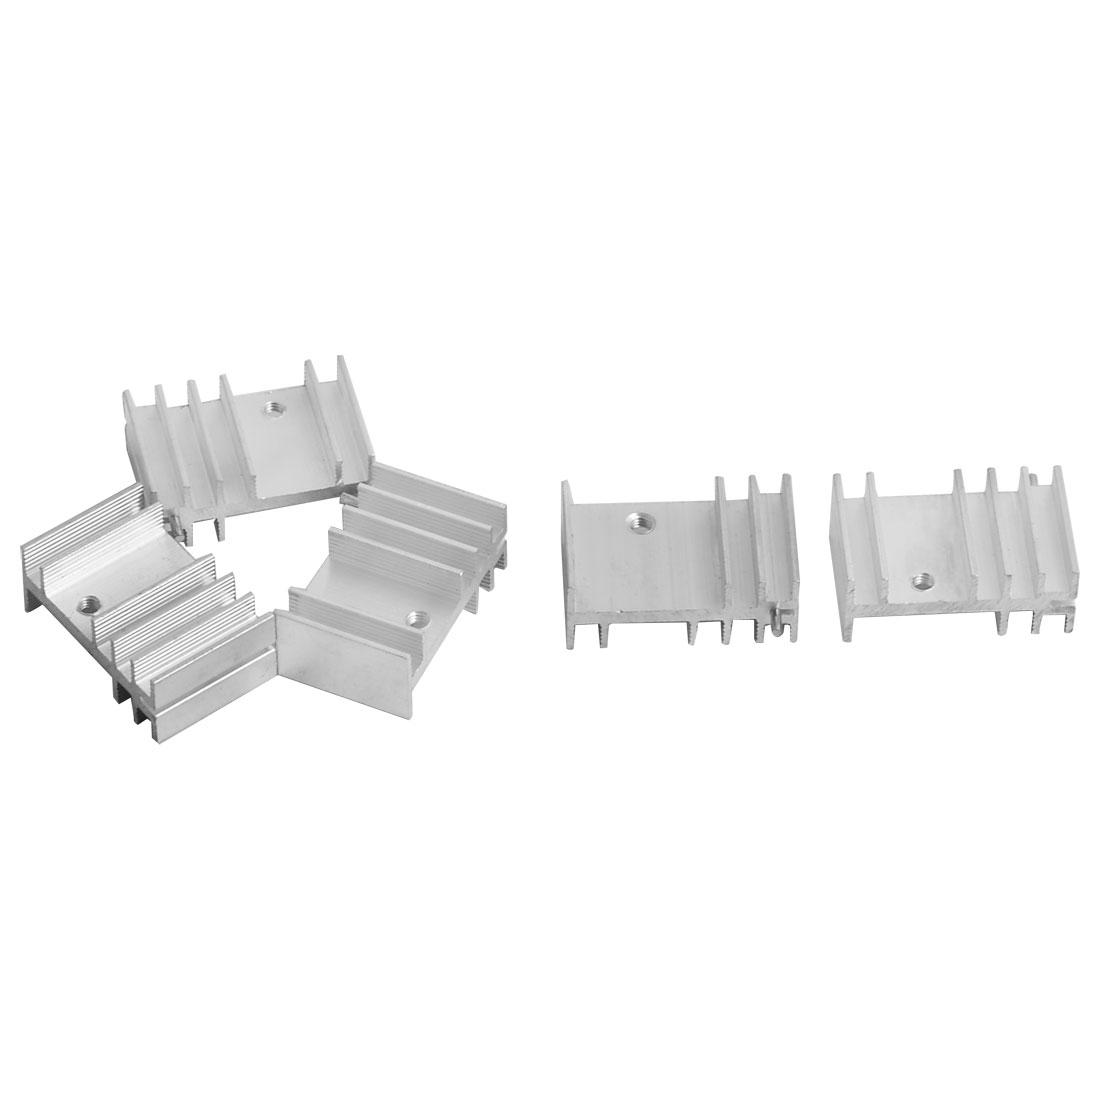 Aluminium Heatsink Diffusion Cooling Cooler Fin 28mm x 18mm x 11mm 5 Pcs